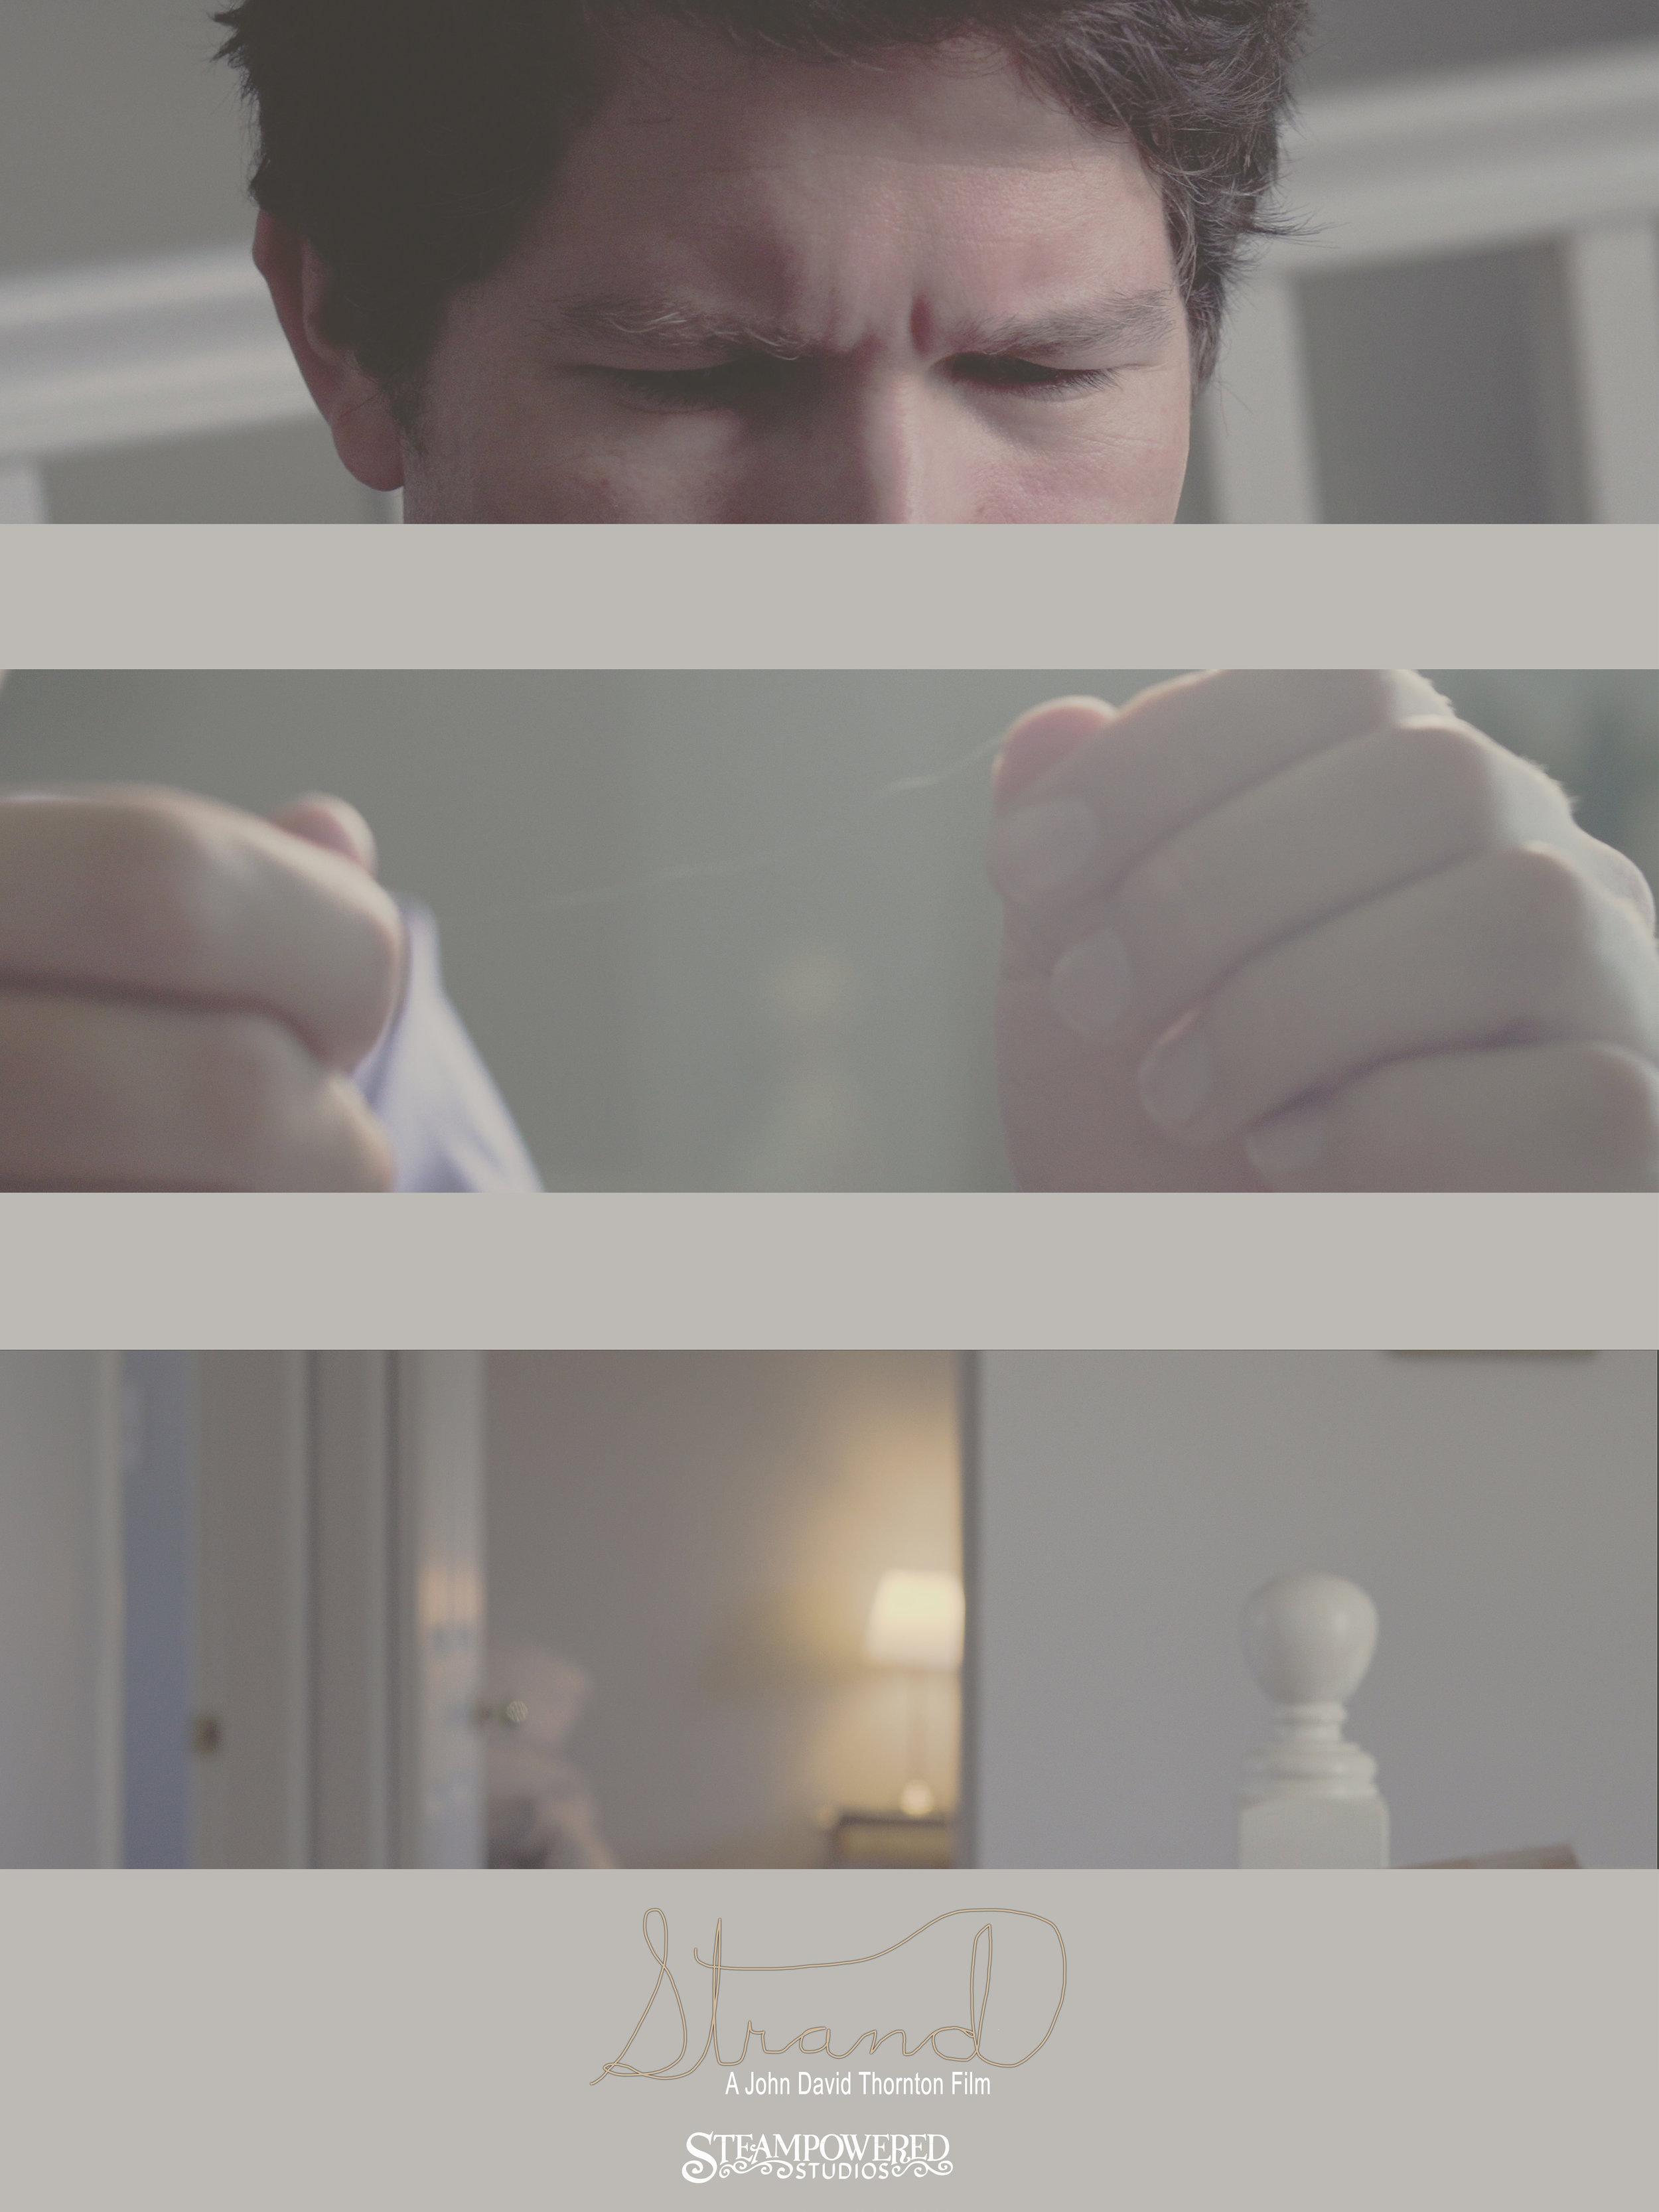 Strand, 2018 - Short Film